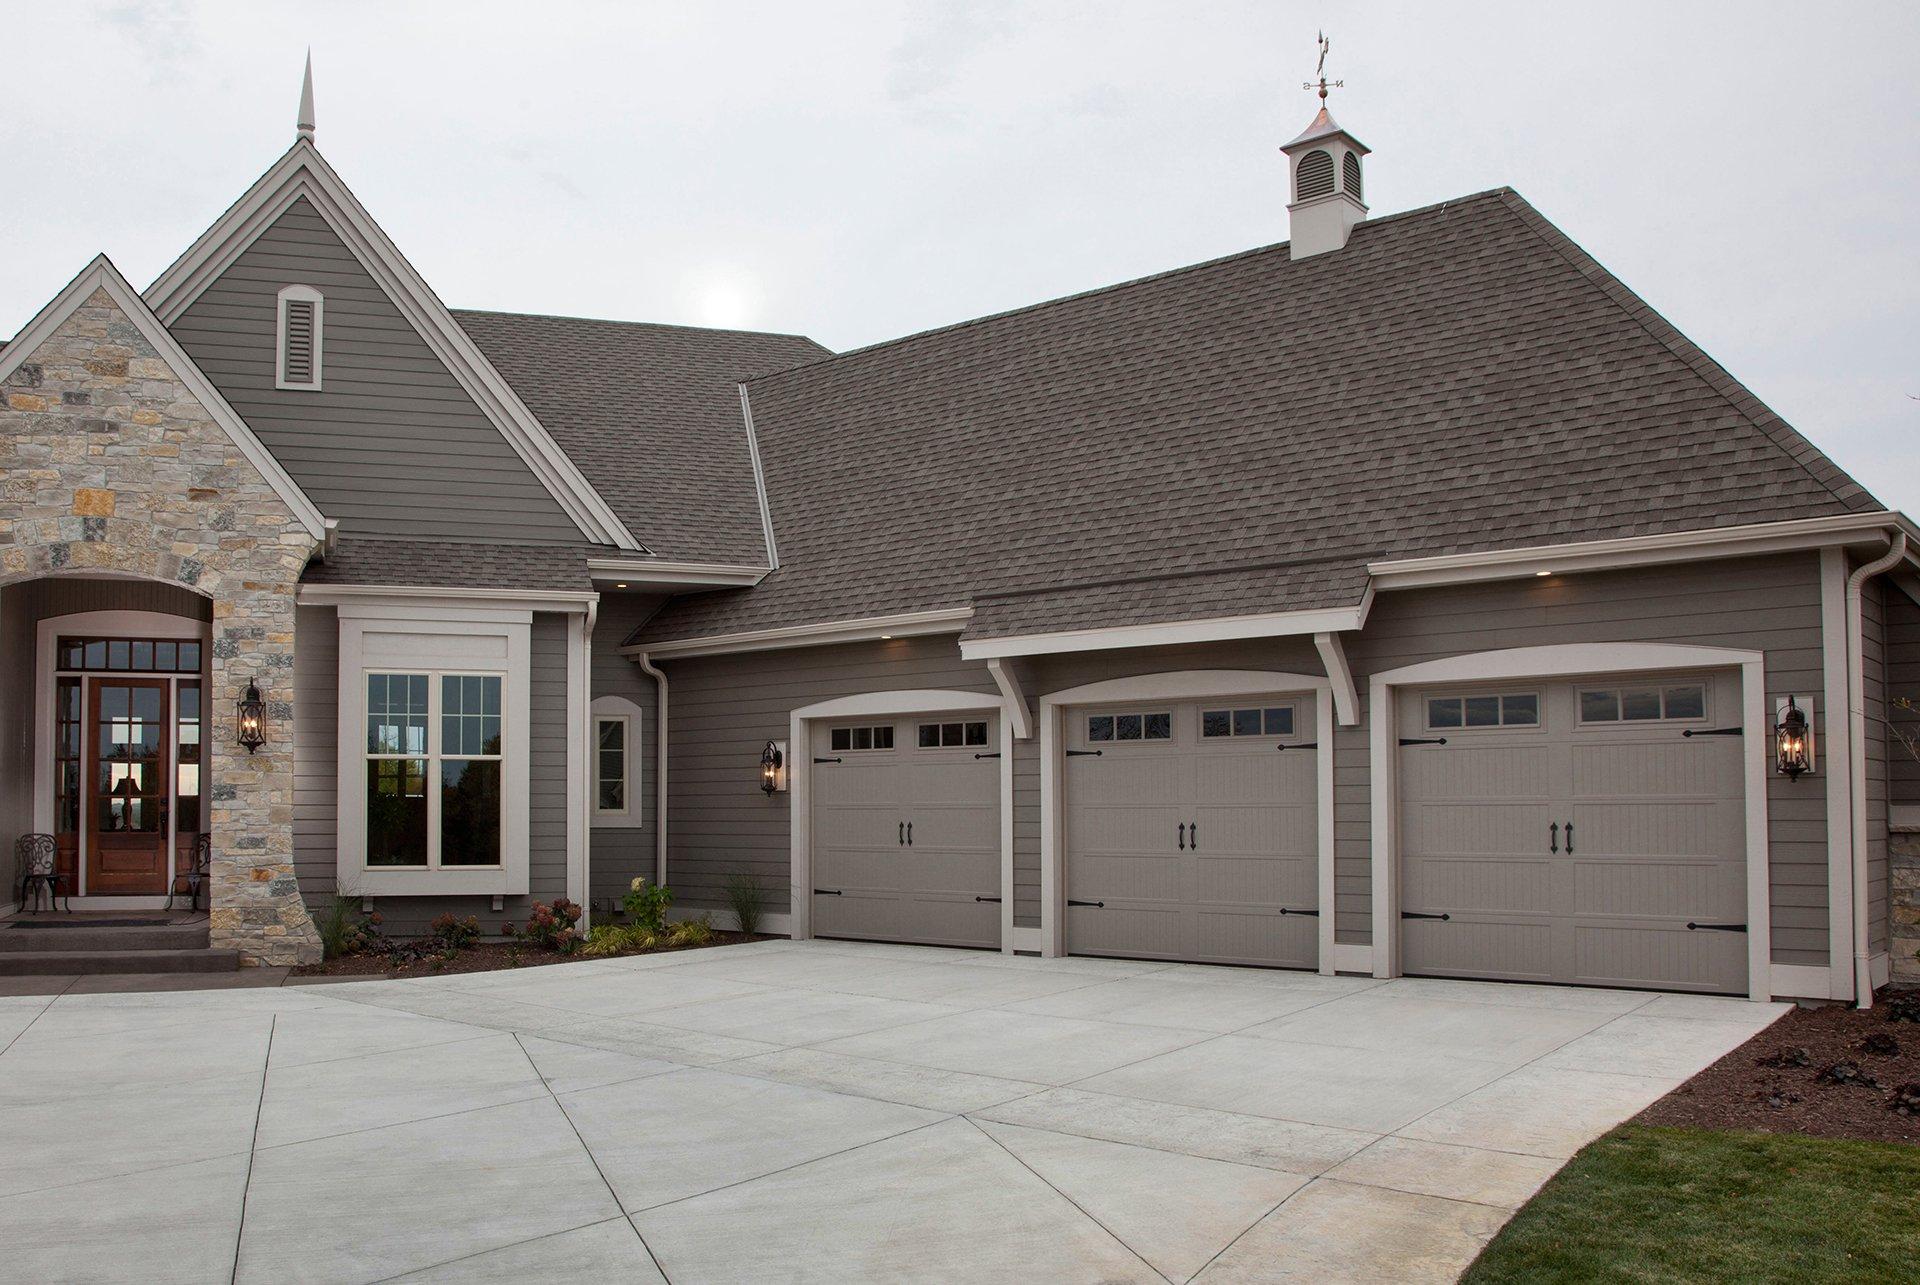 services depot design sears door installation ideas clifton interior photos home garage wonderful